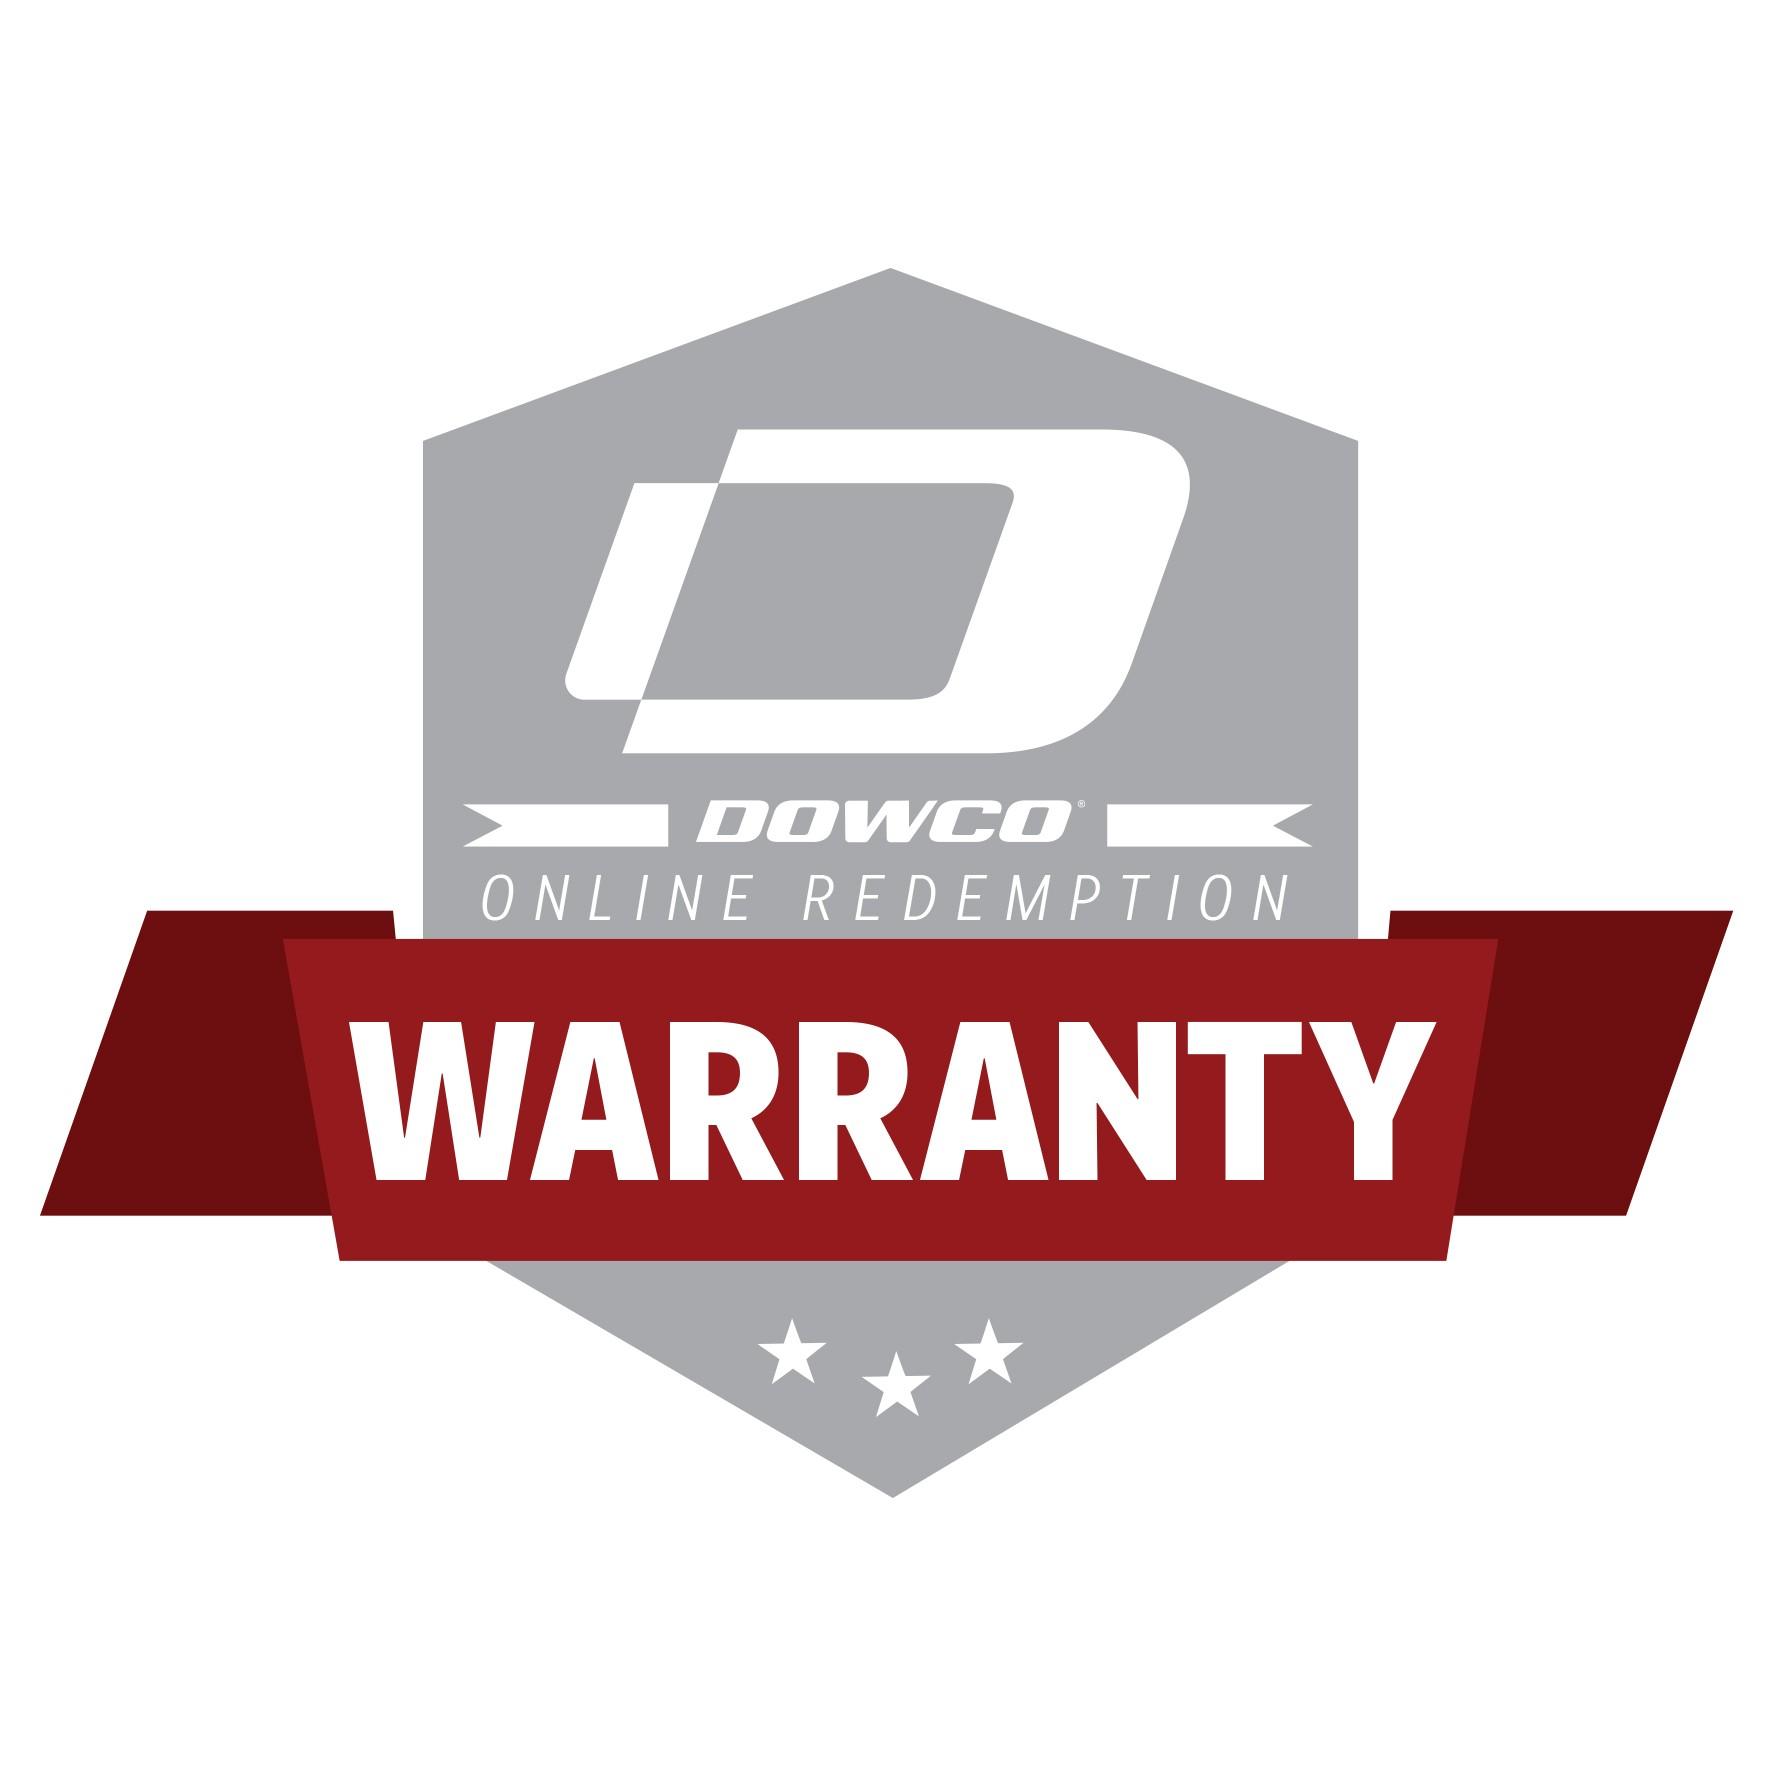 Warranty Returns